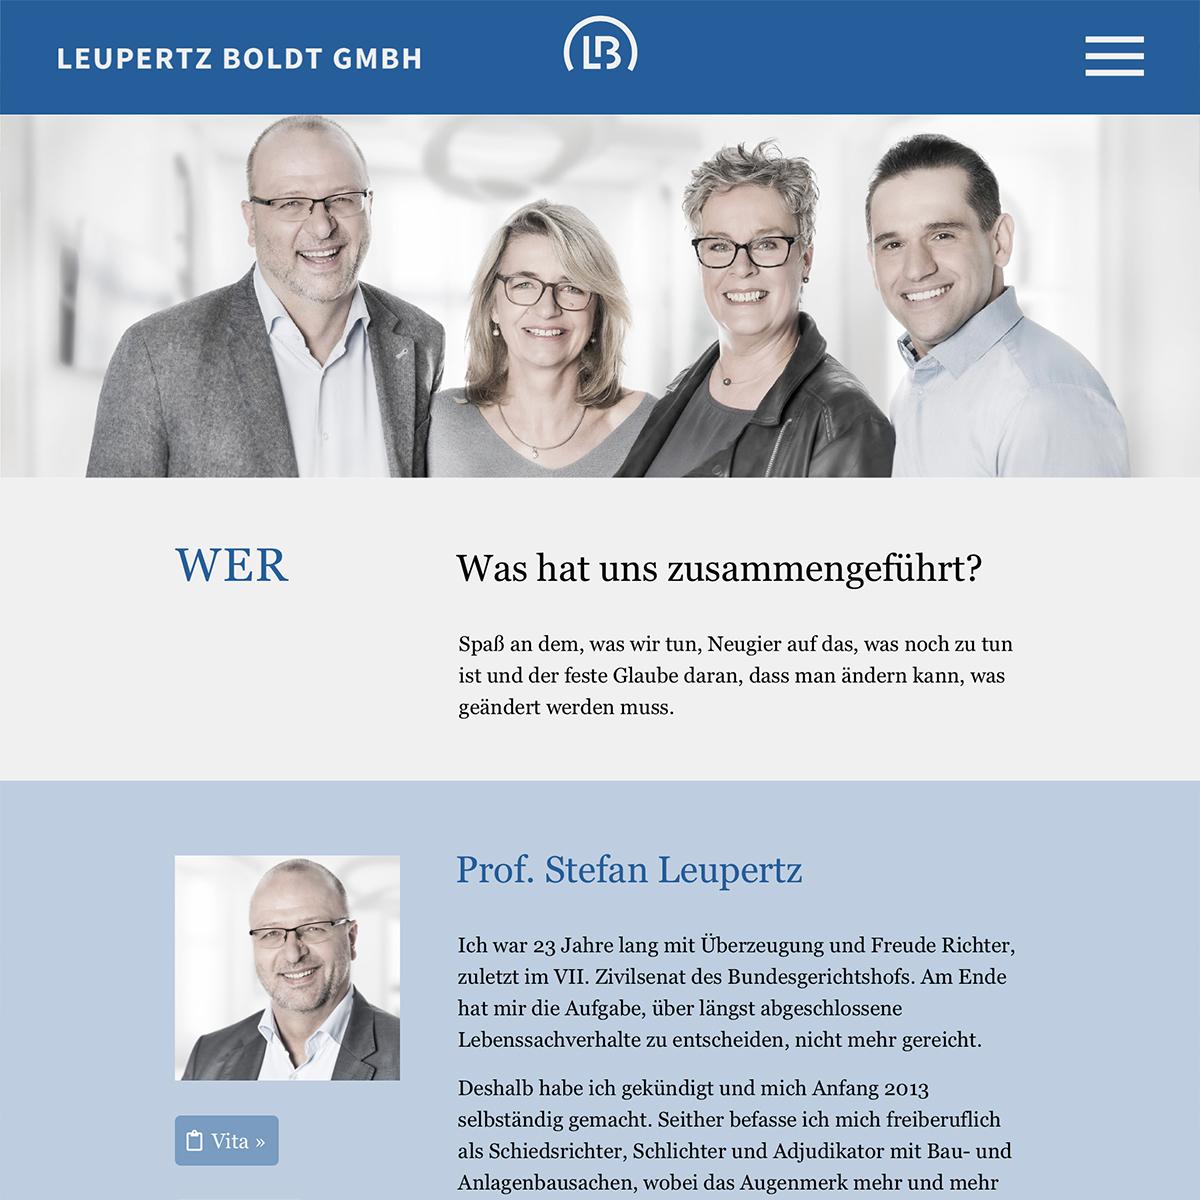 fd-work-website-leupertz-boldt